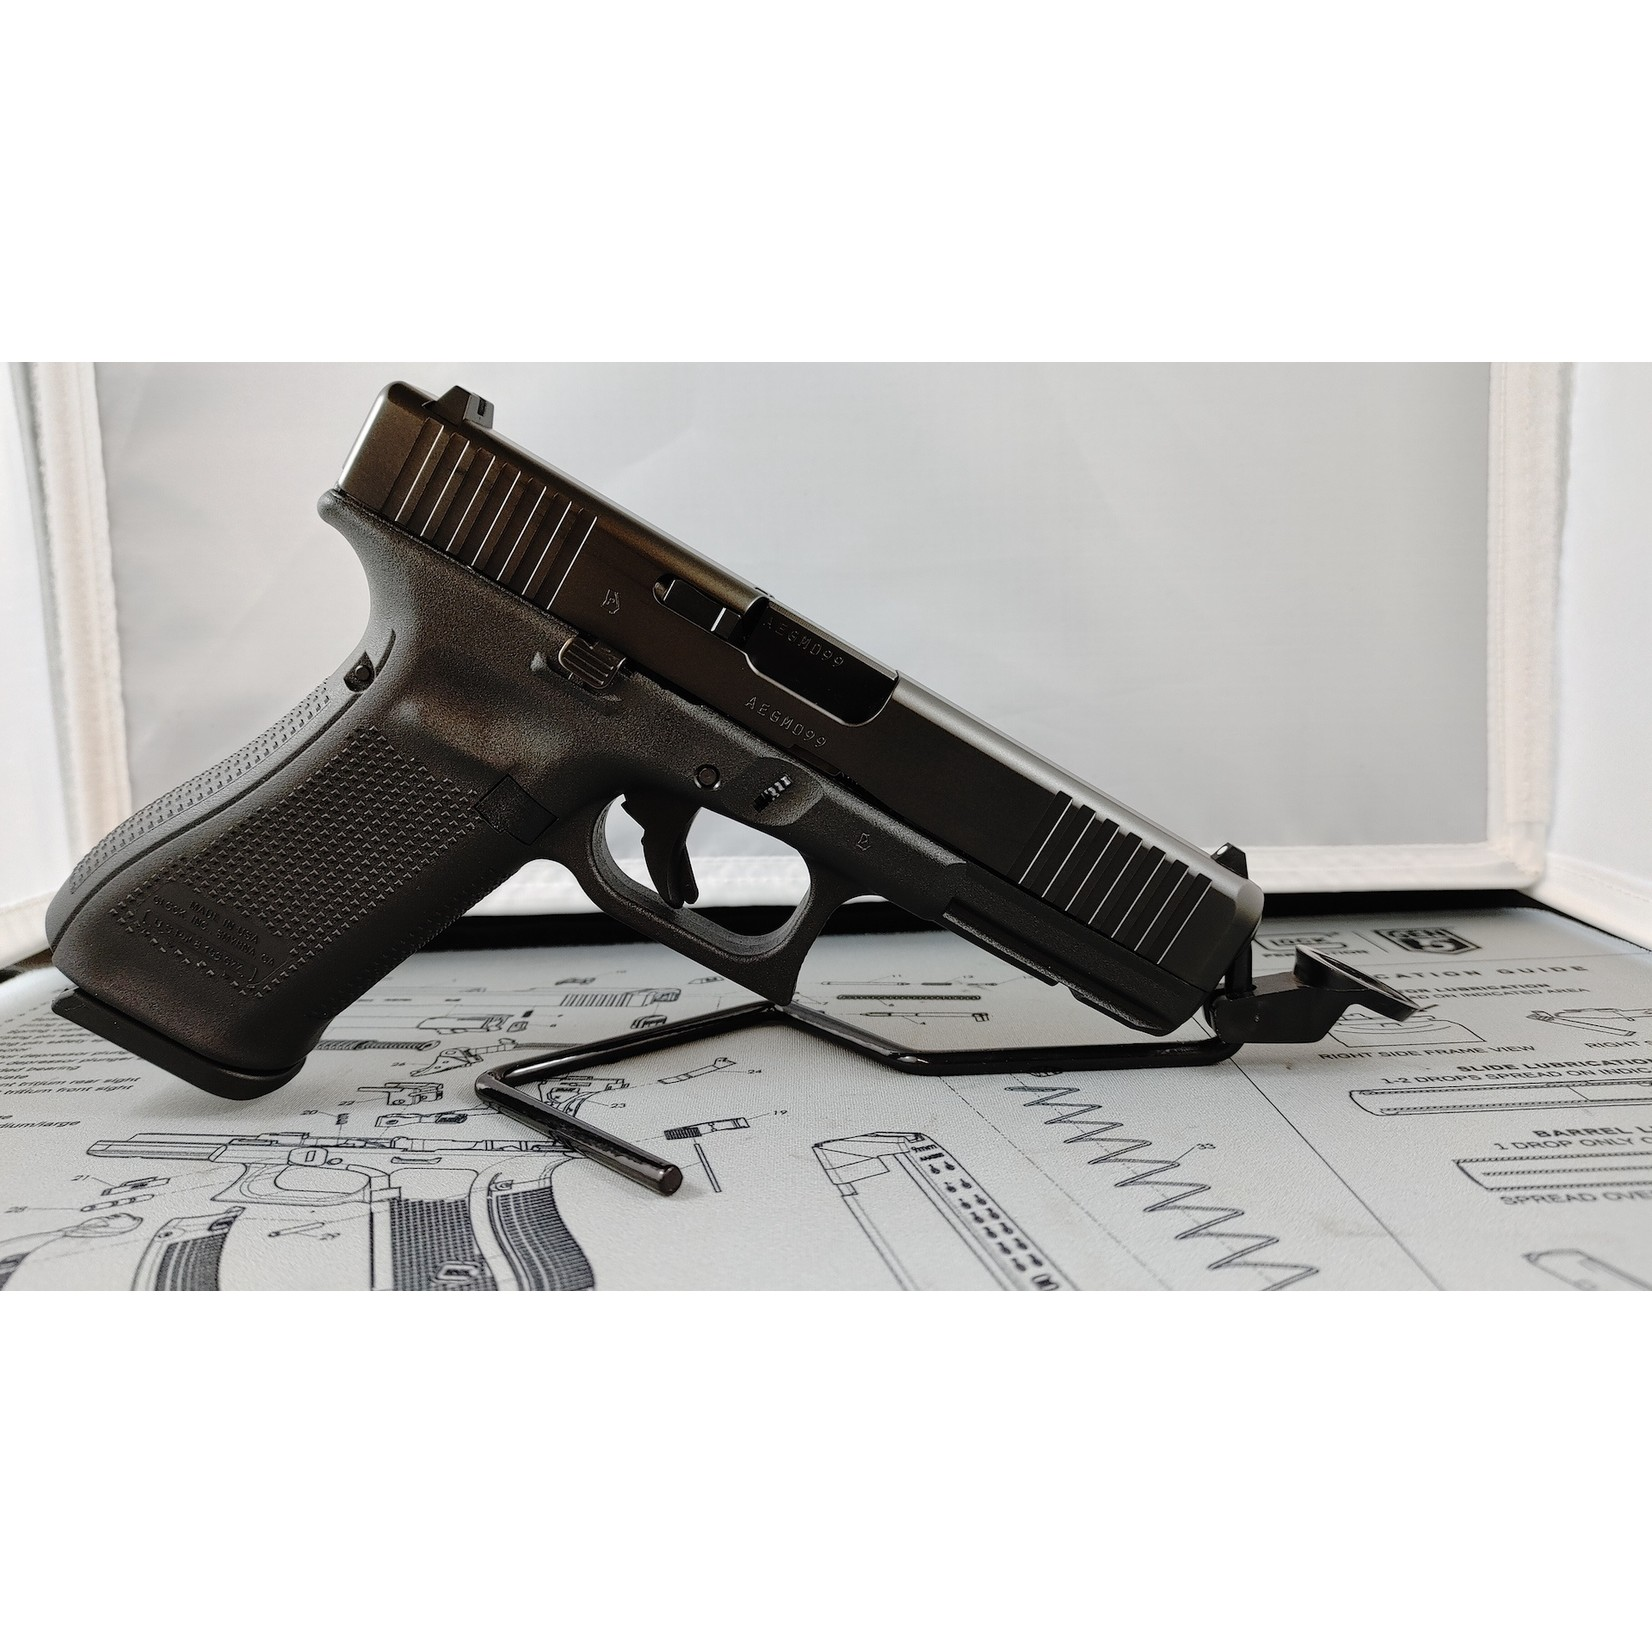 Glock Glock 17 Gen5 9mm Fixed SIghts